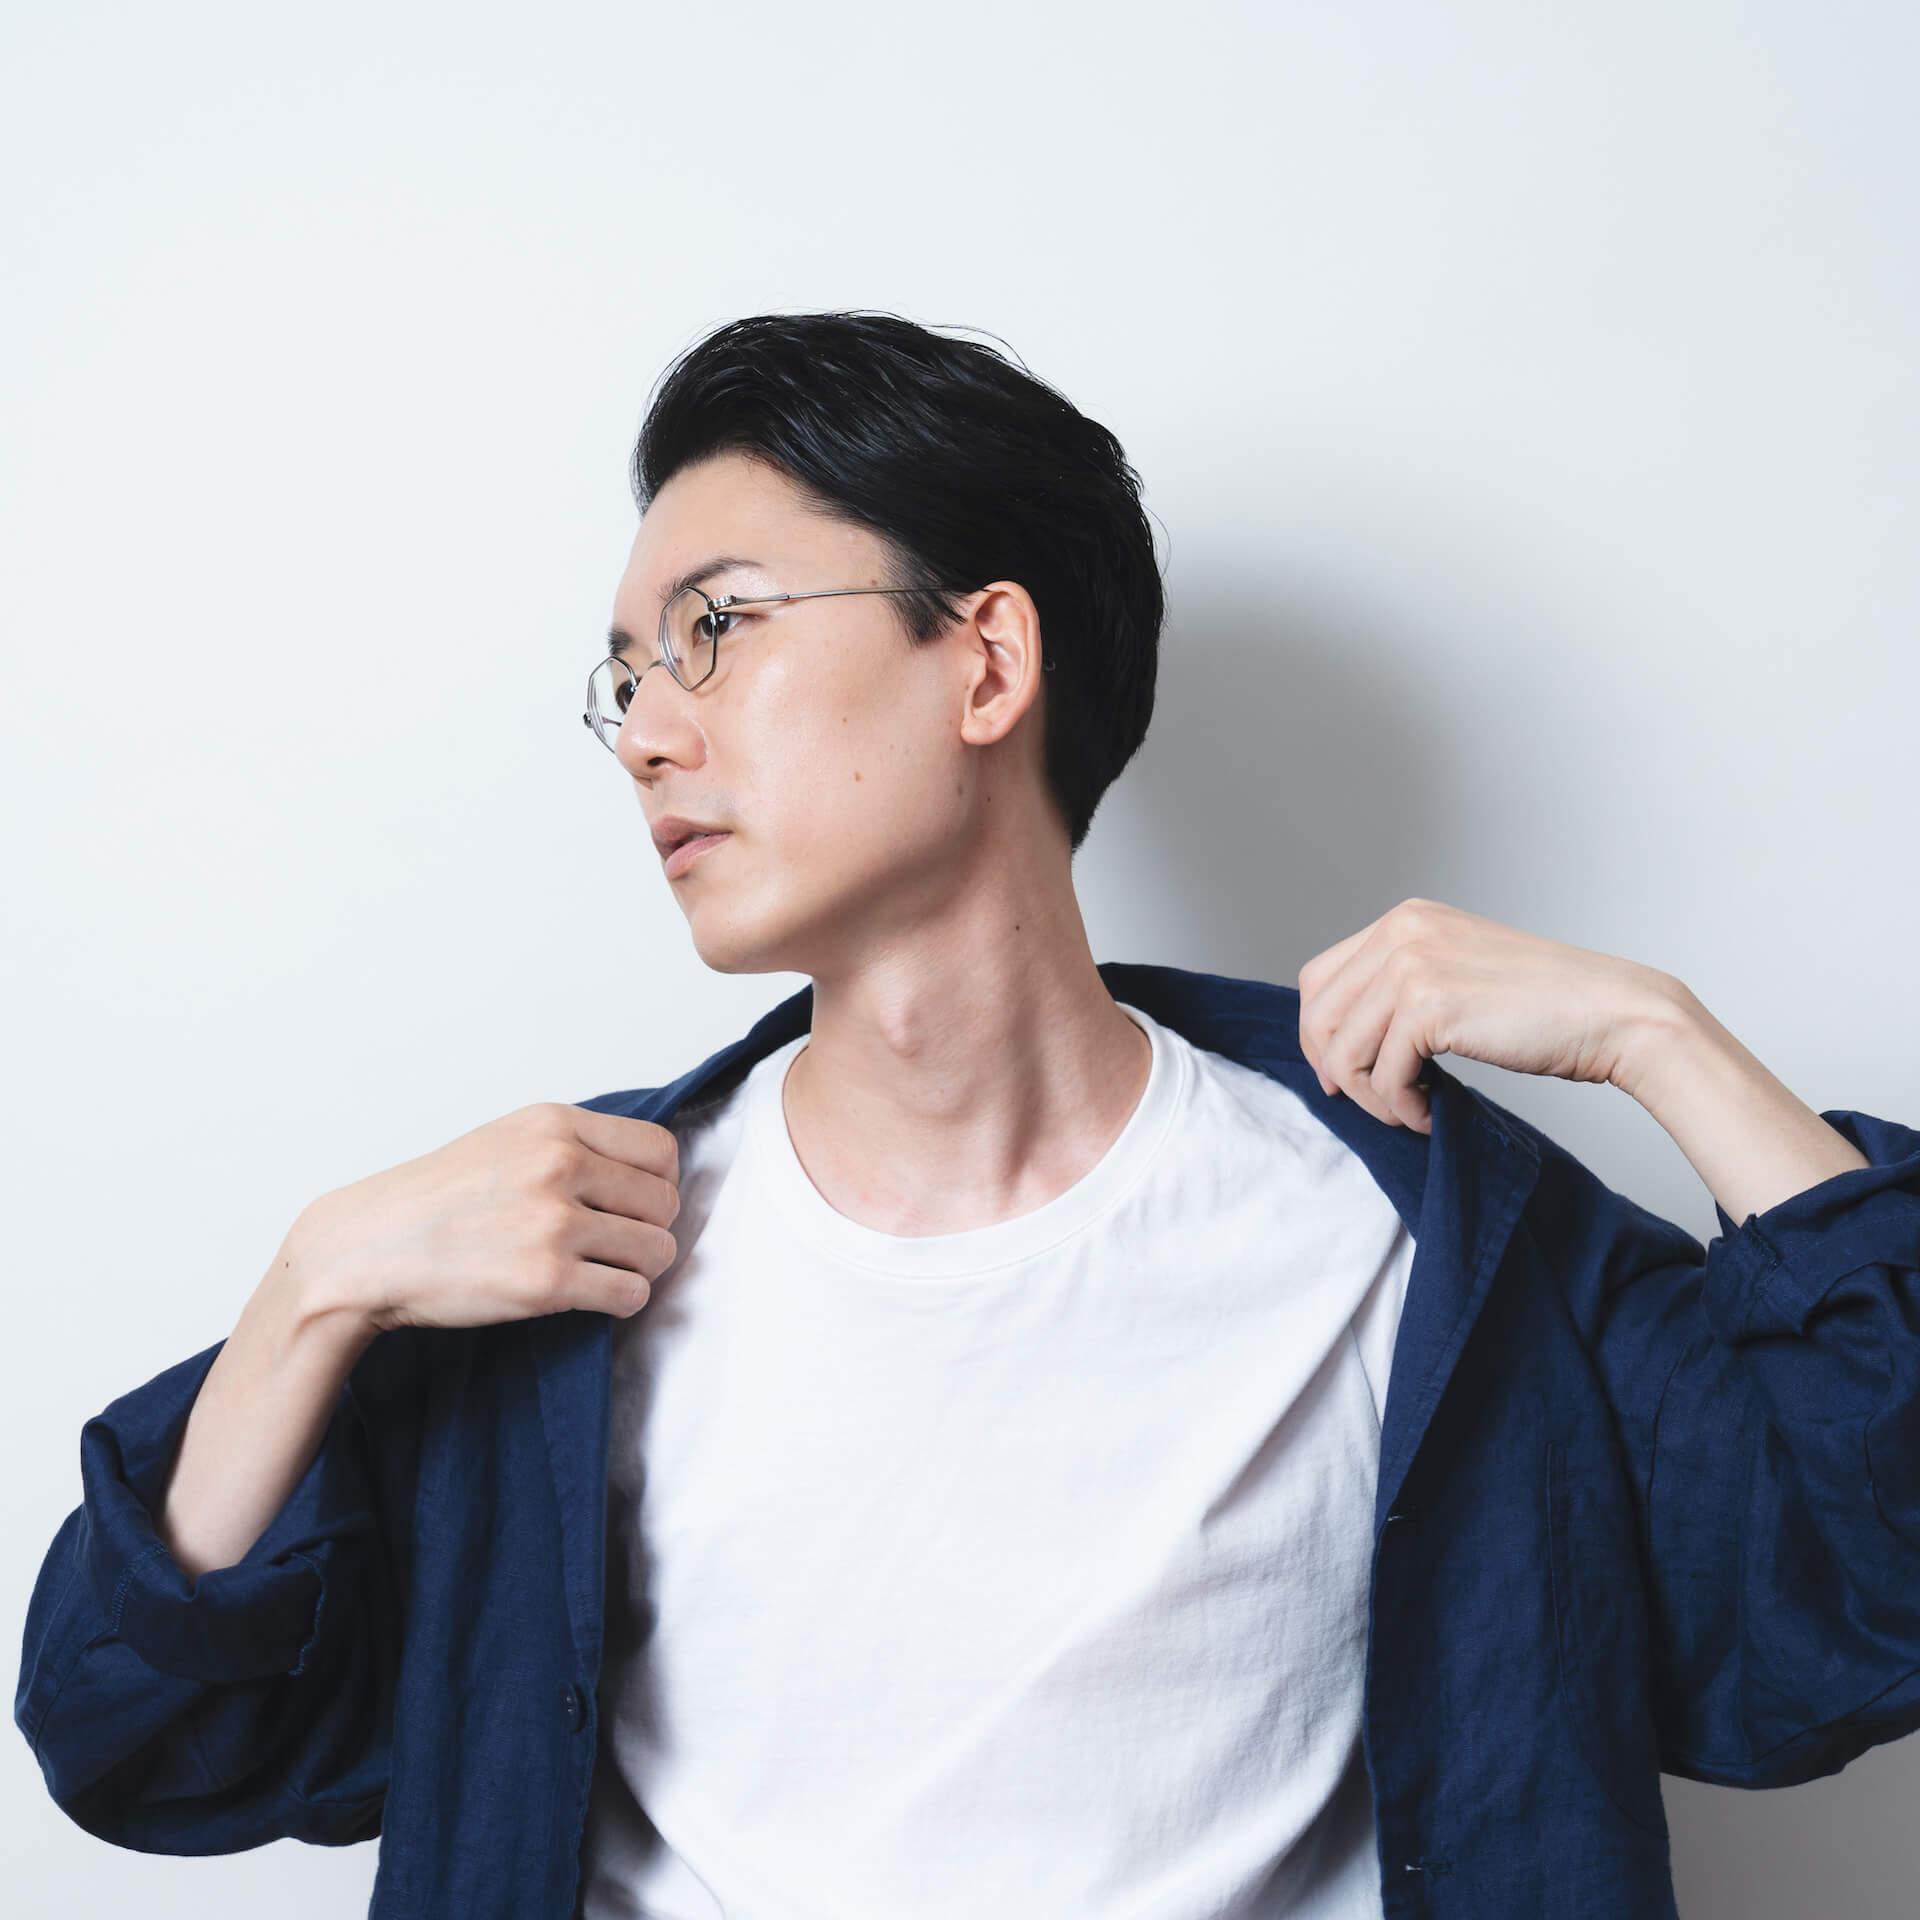 〈origami PRODUCTIONS〉アーティストが一堂に会するイベント<origami SAI 2021 Osaka>大阪で初開催決定! music210422_origamisai-2021-210422-210422_3